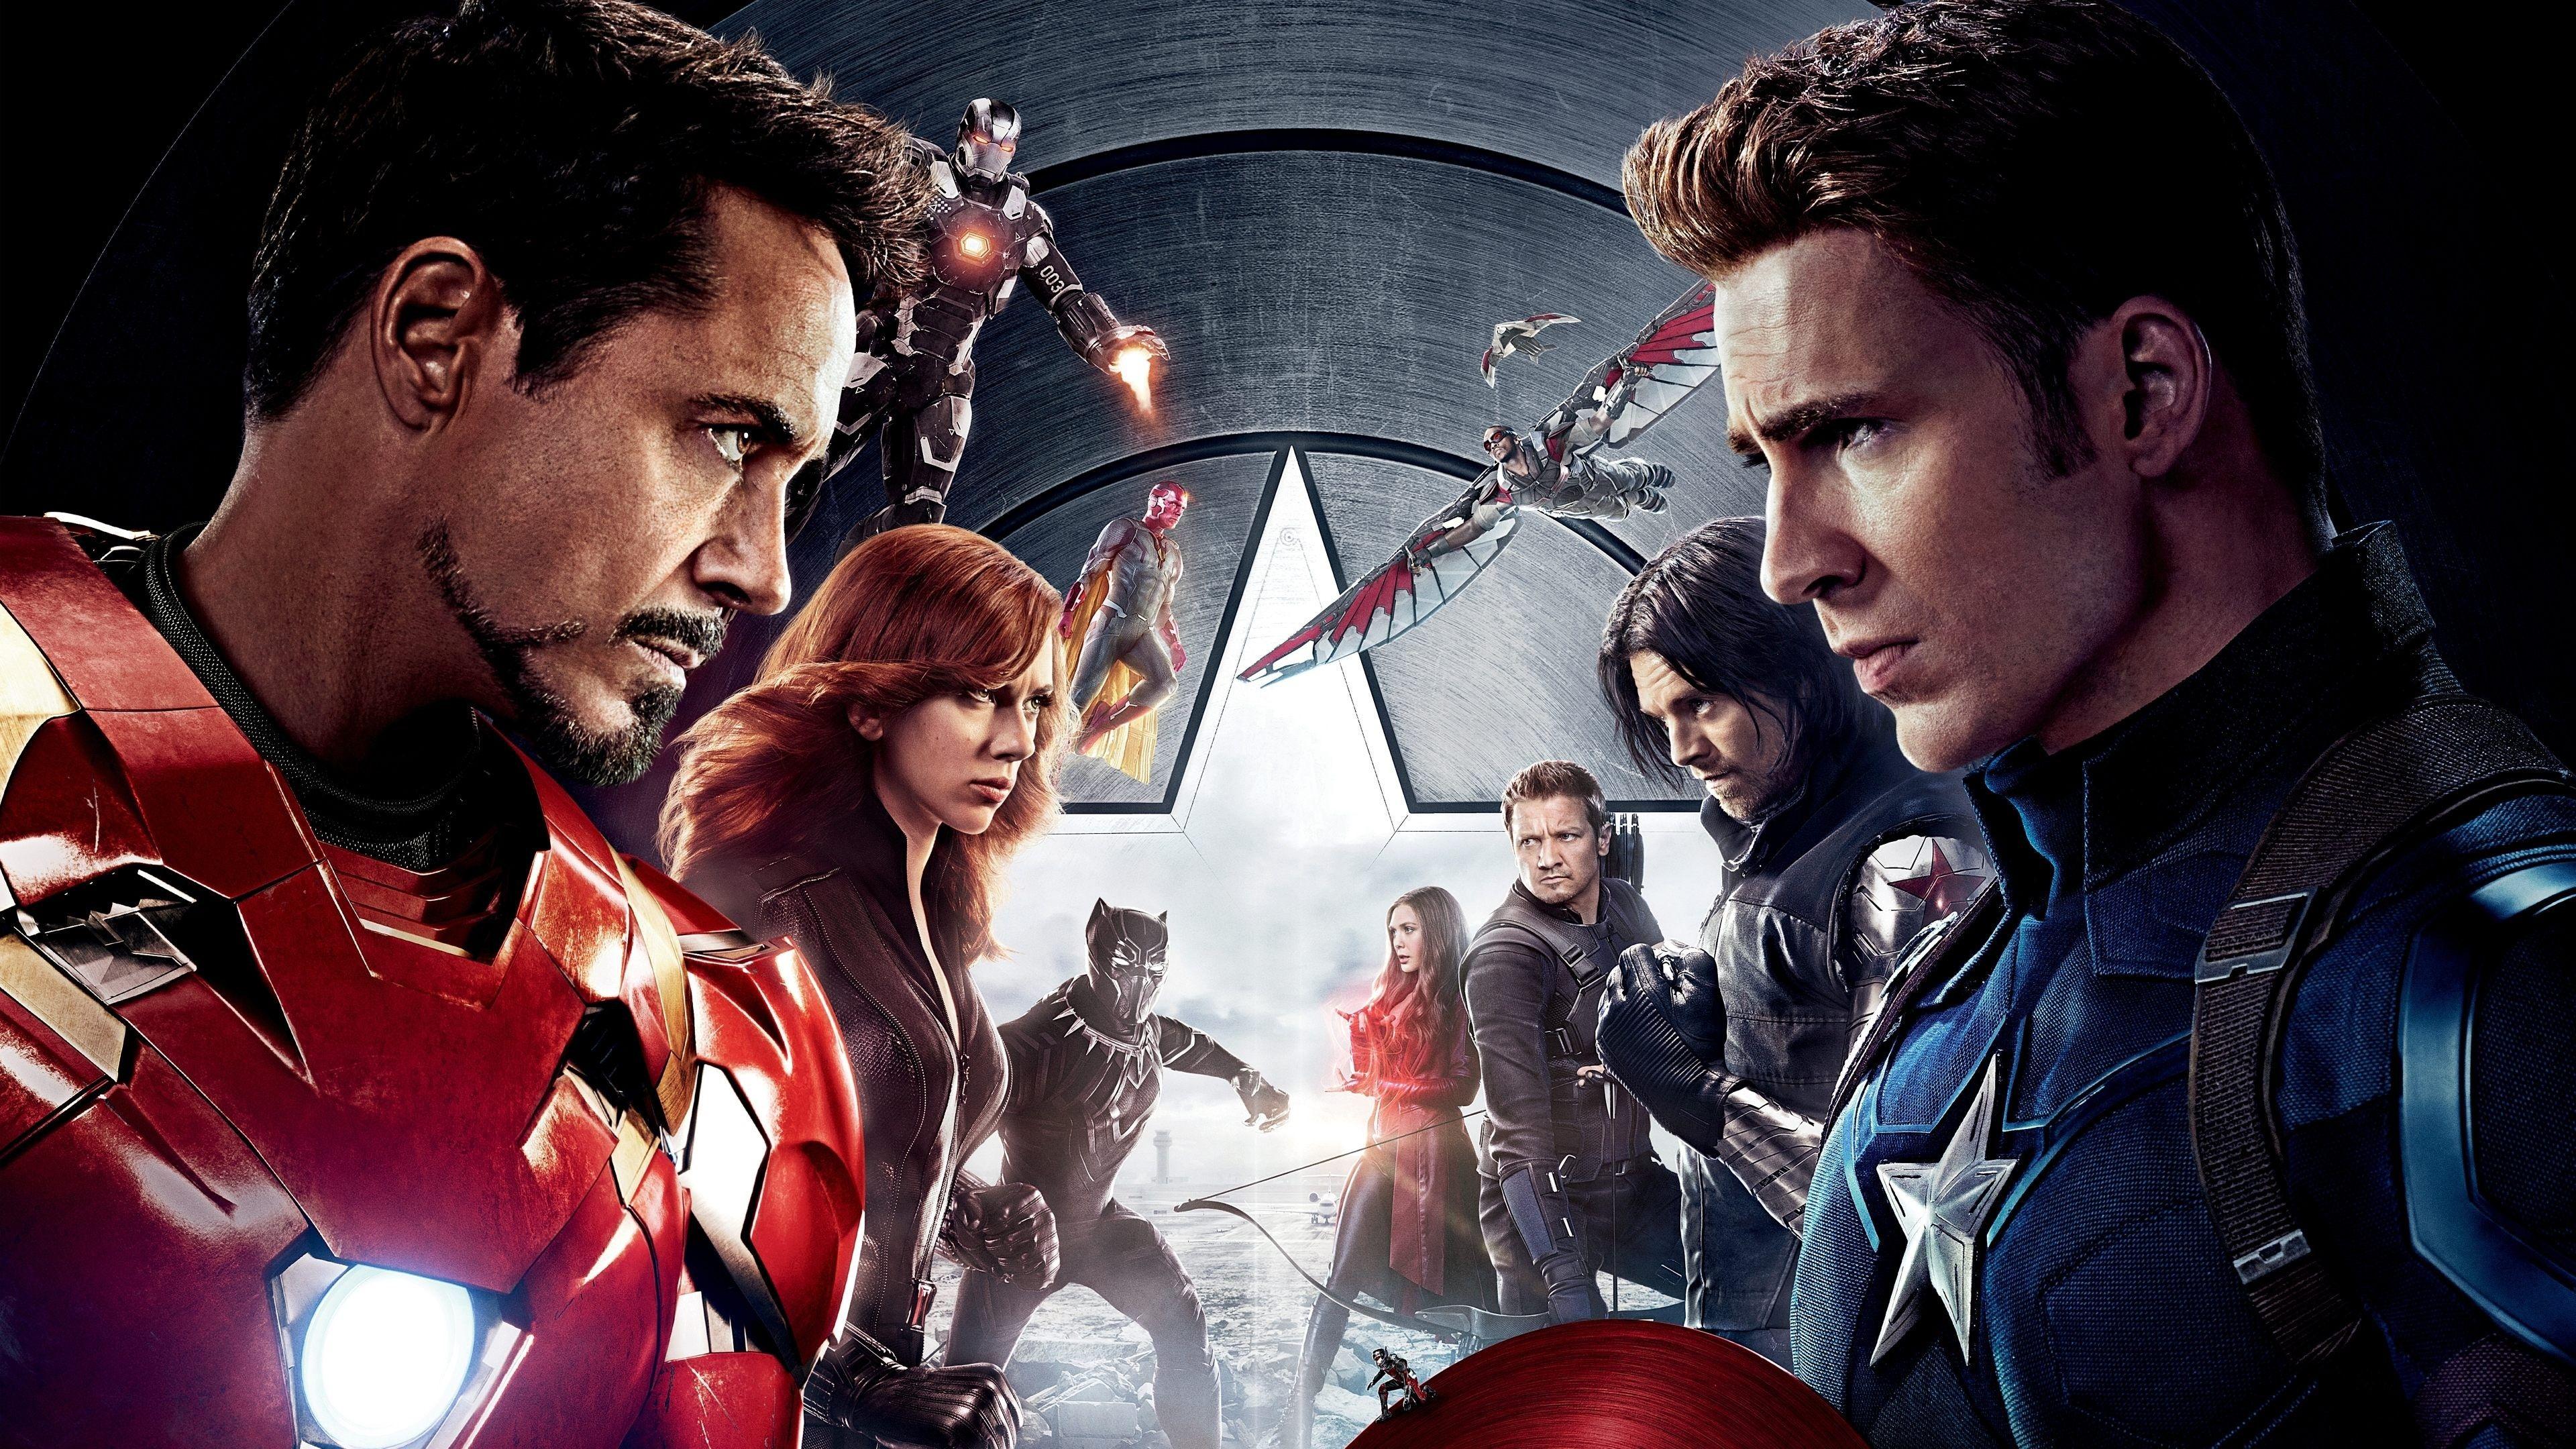 Captain America Civil War Movie 4k Ultra Hd Wallpaper Captain America Civil War Movie Captain America Civil War Civil War Characters